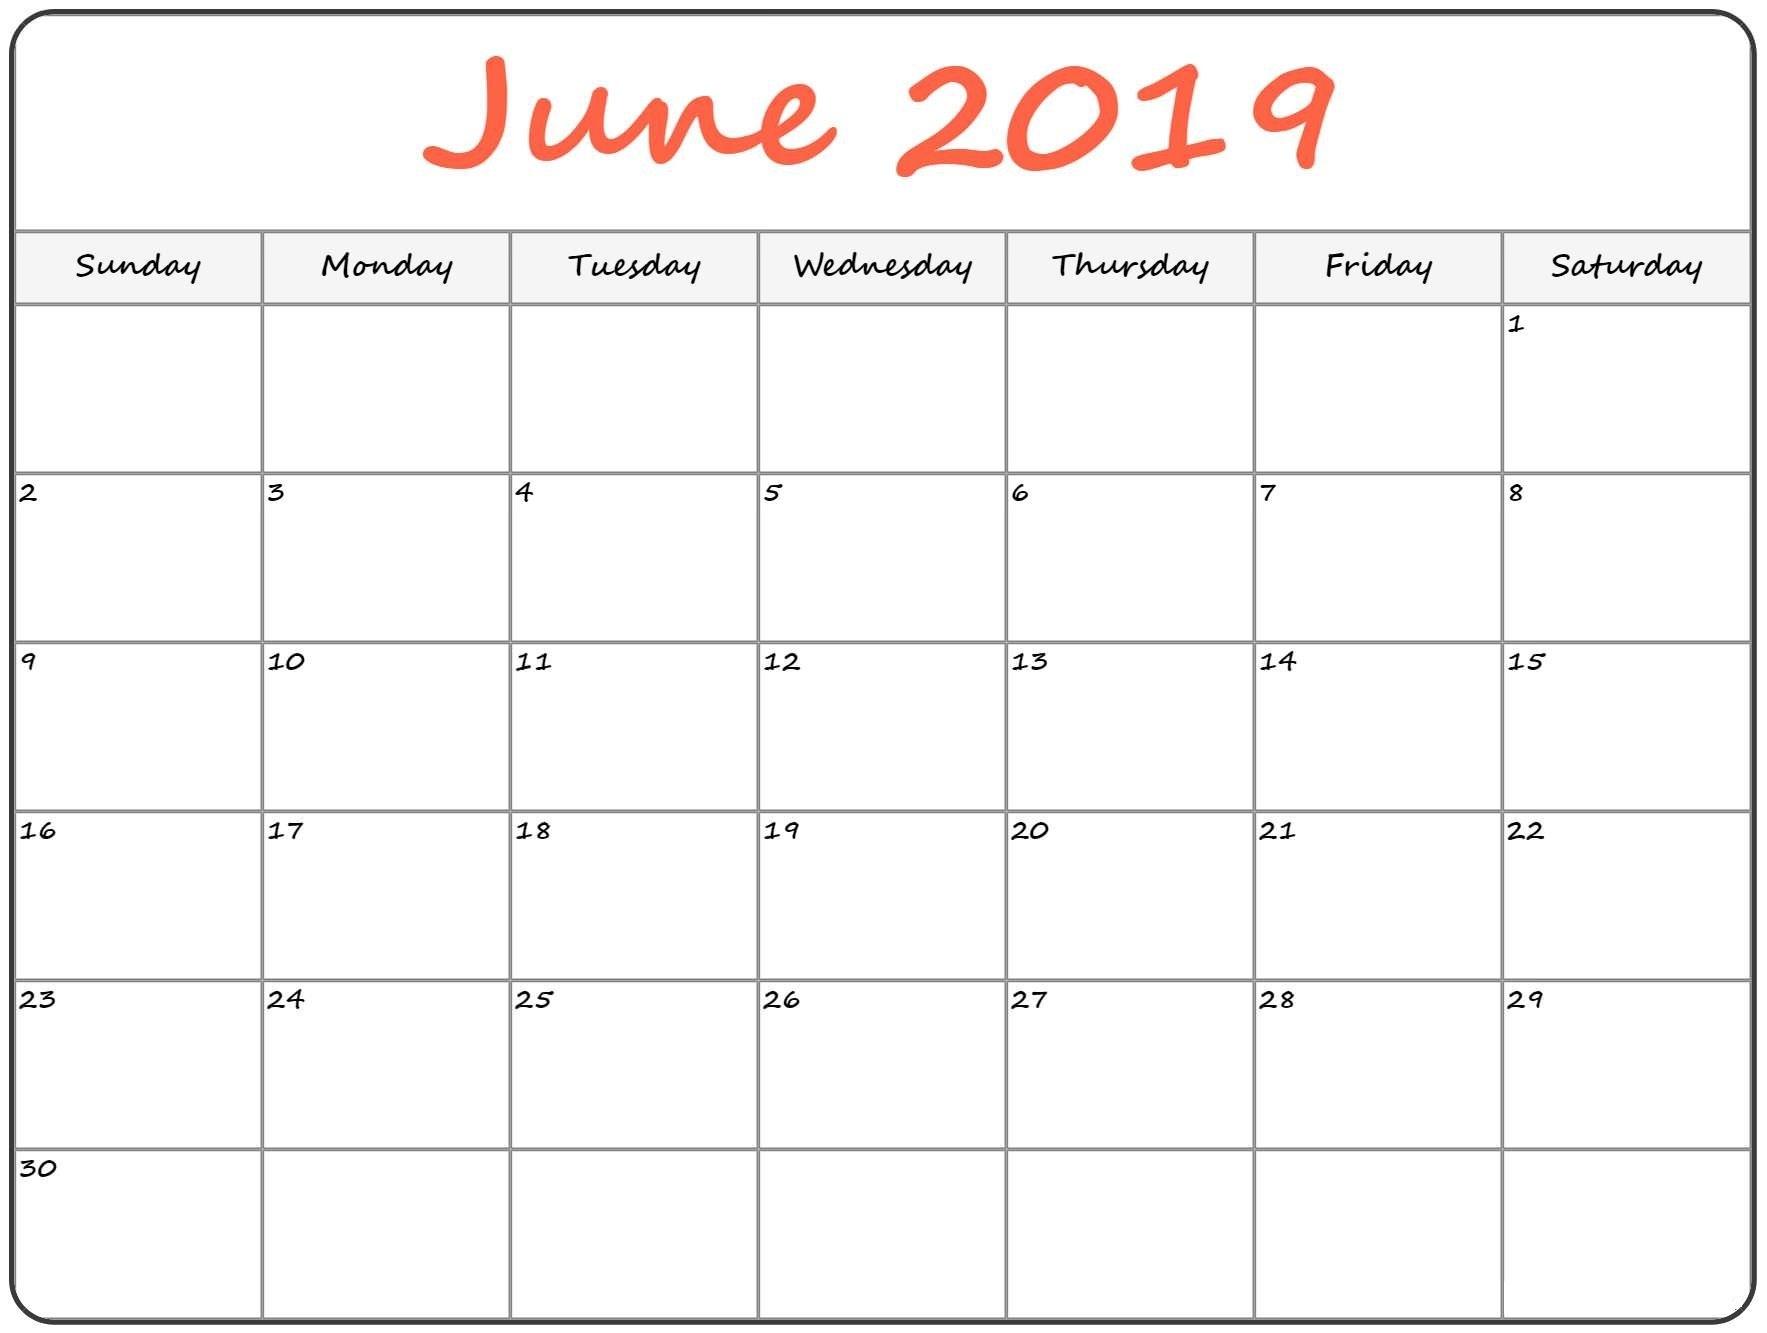 June 2019 Holiday Blank Calendar Download – Printable Calendar 2018 Calendar 2019 Monthly Printable With Holidays